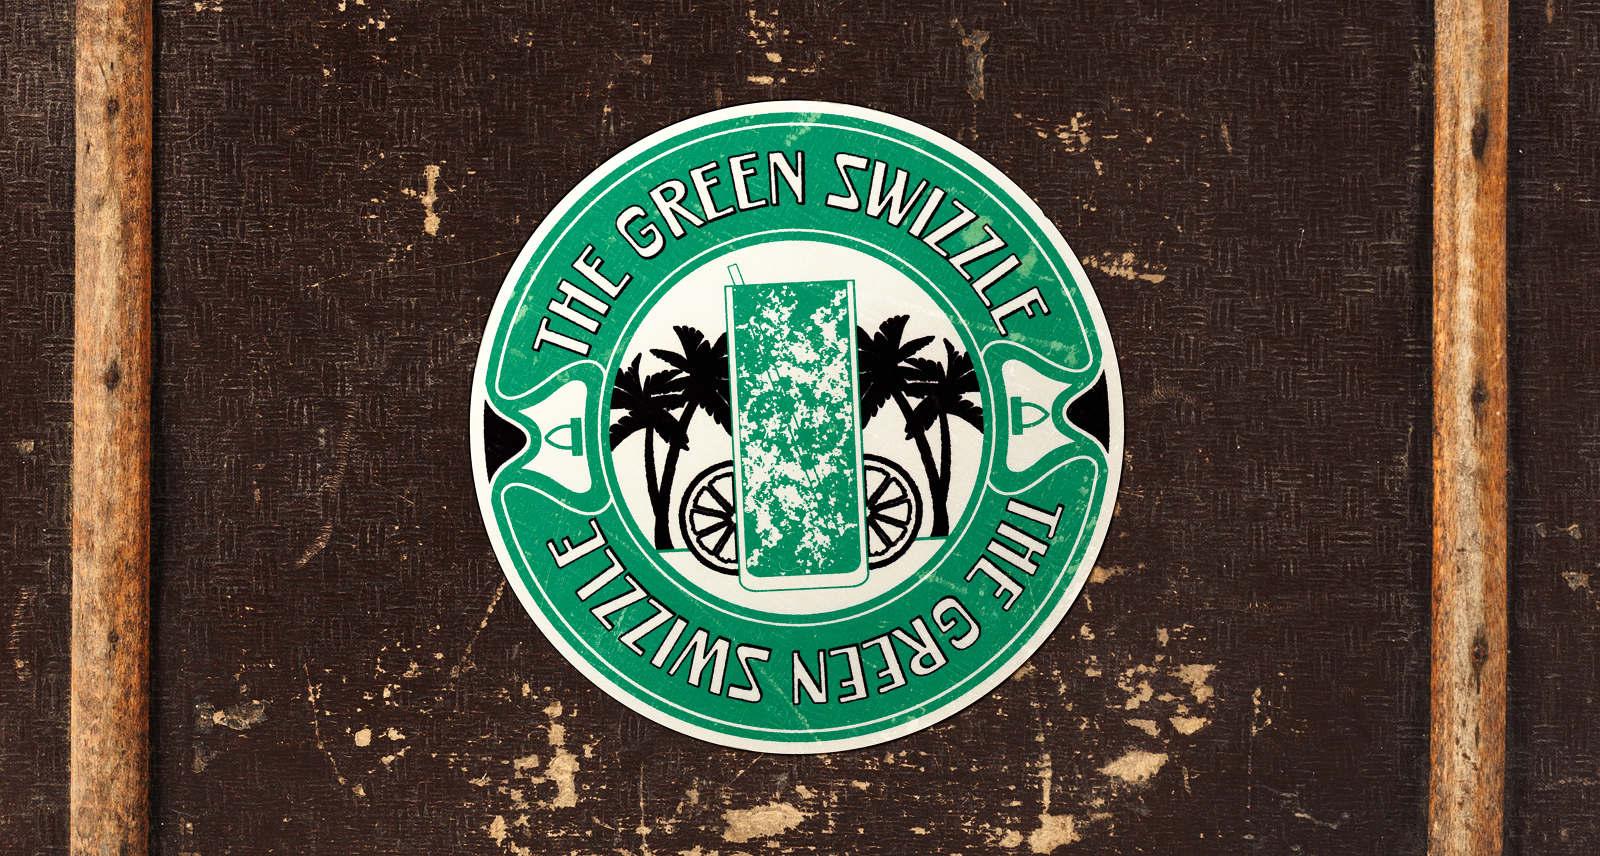 13 the green swizzle